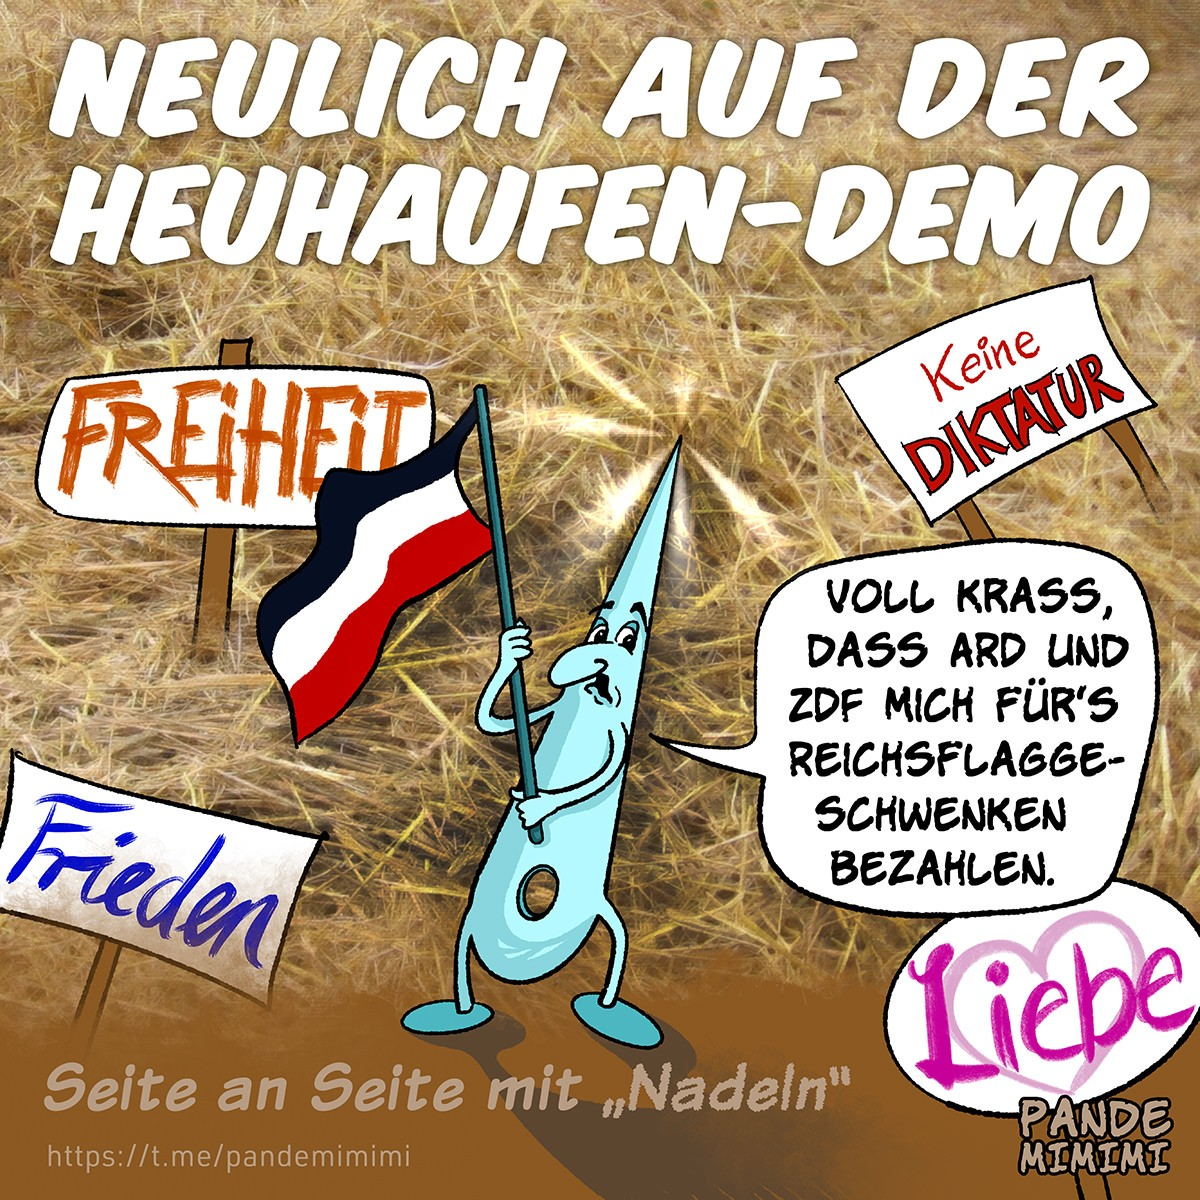 Heuhaufen-Demo, 15.11.2020